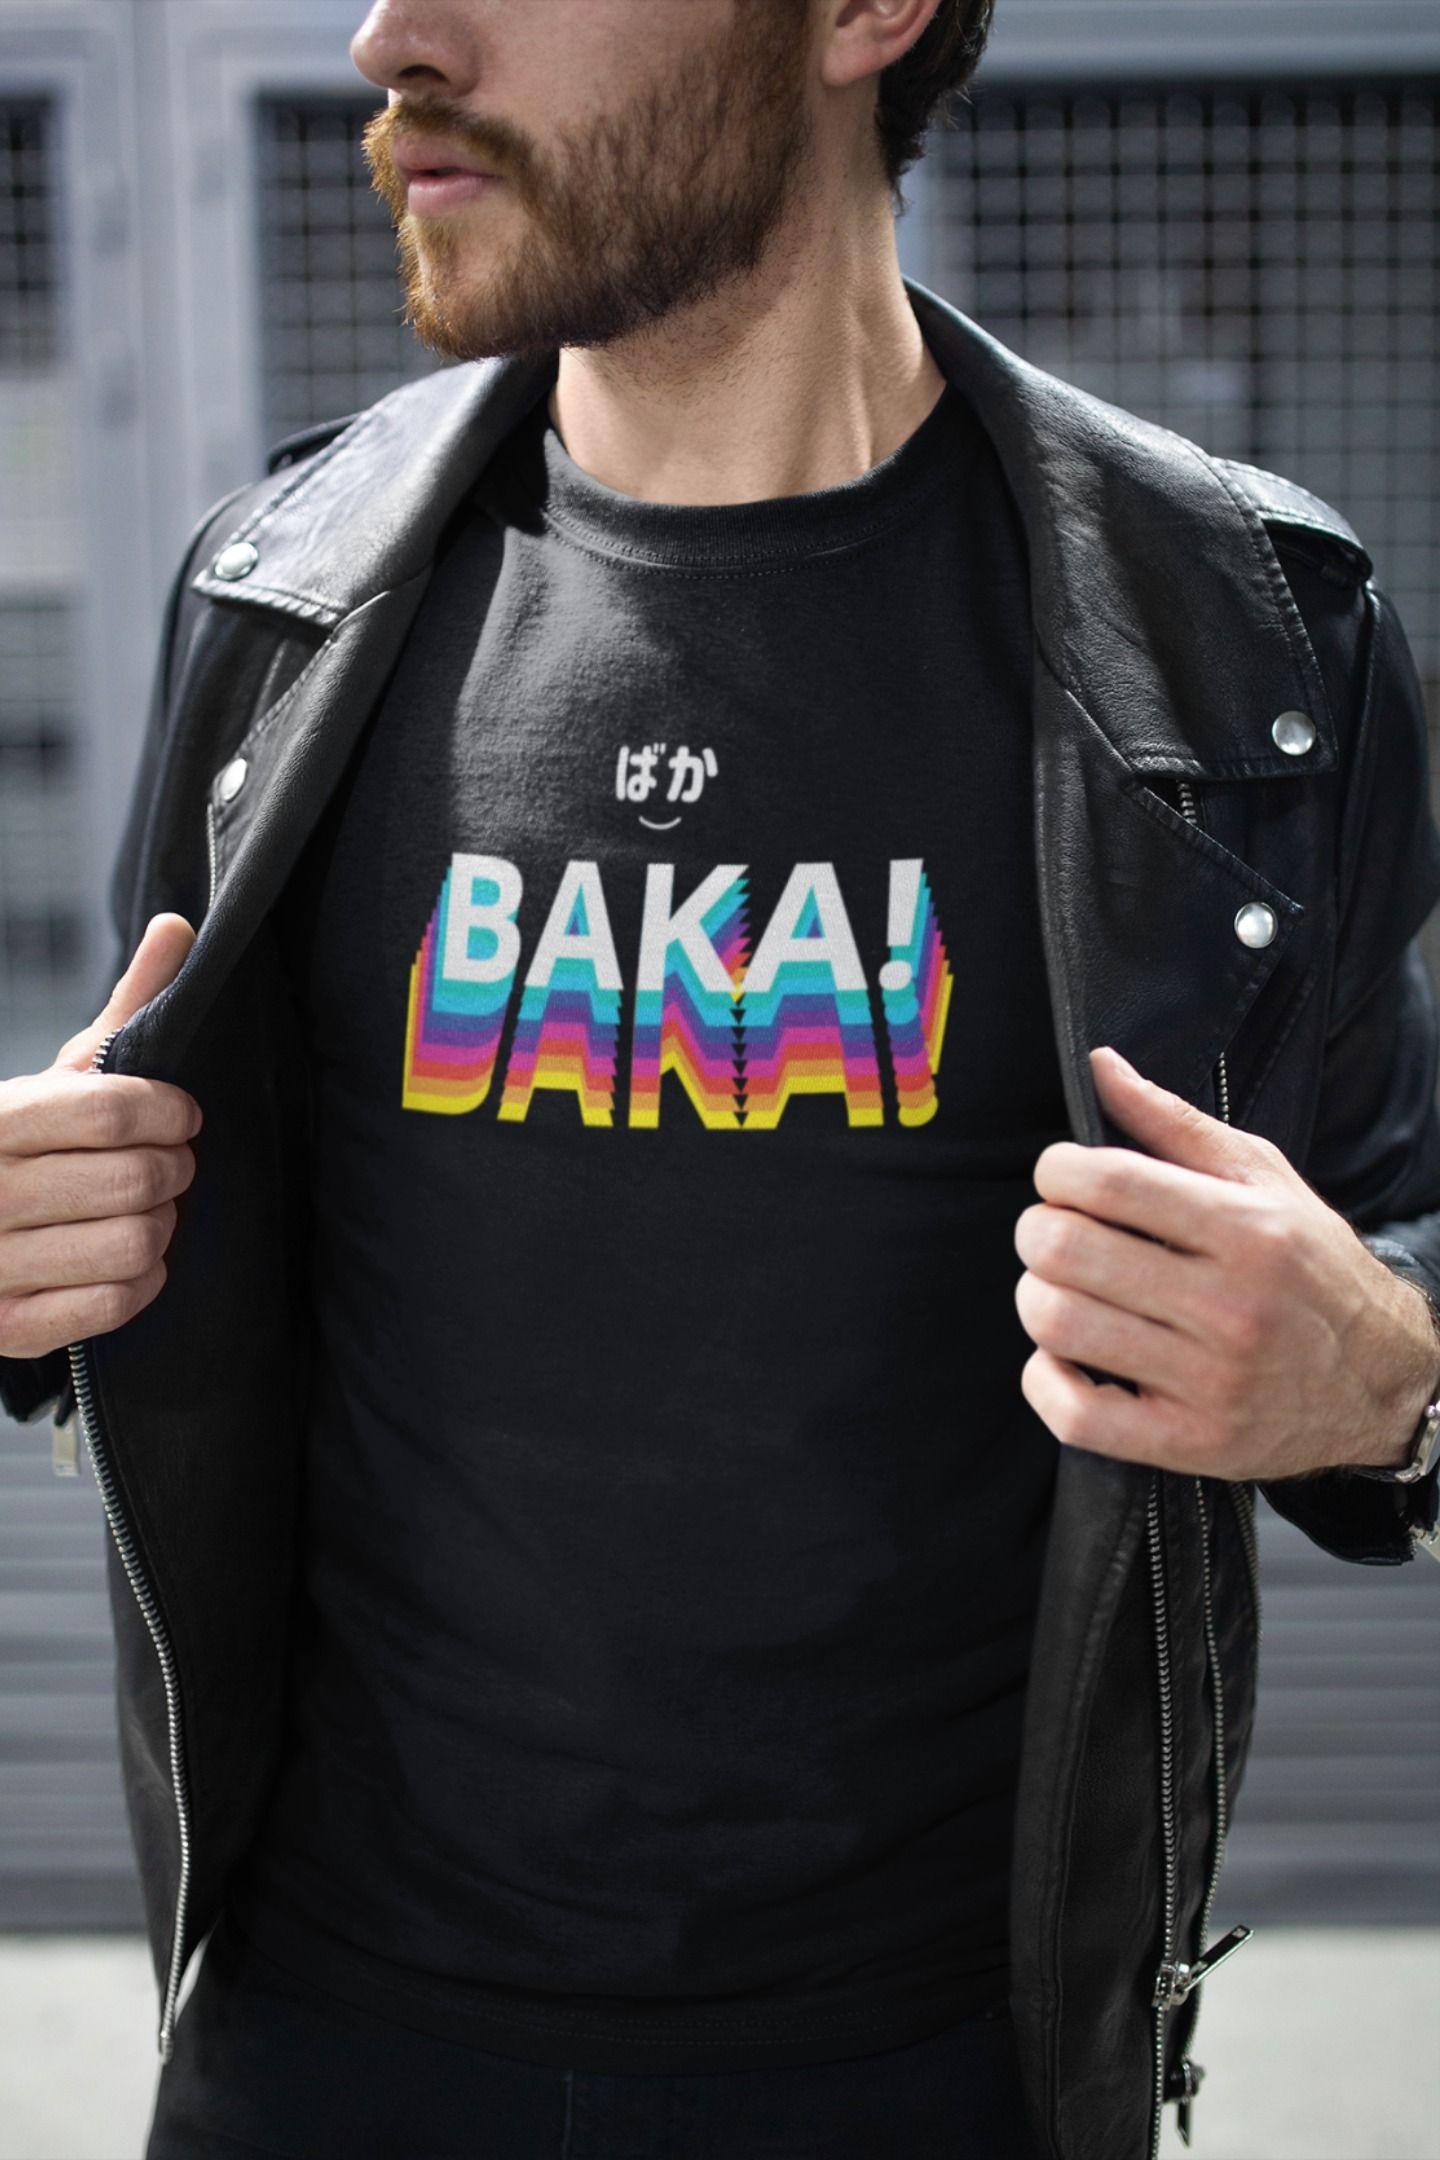 Baka shirt aesthetic shirts buy t shirts online anime